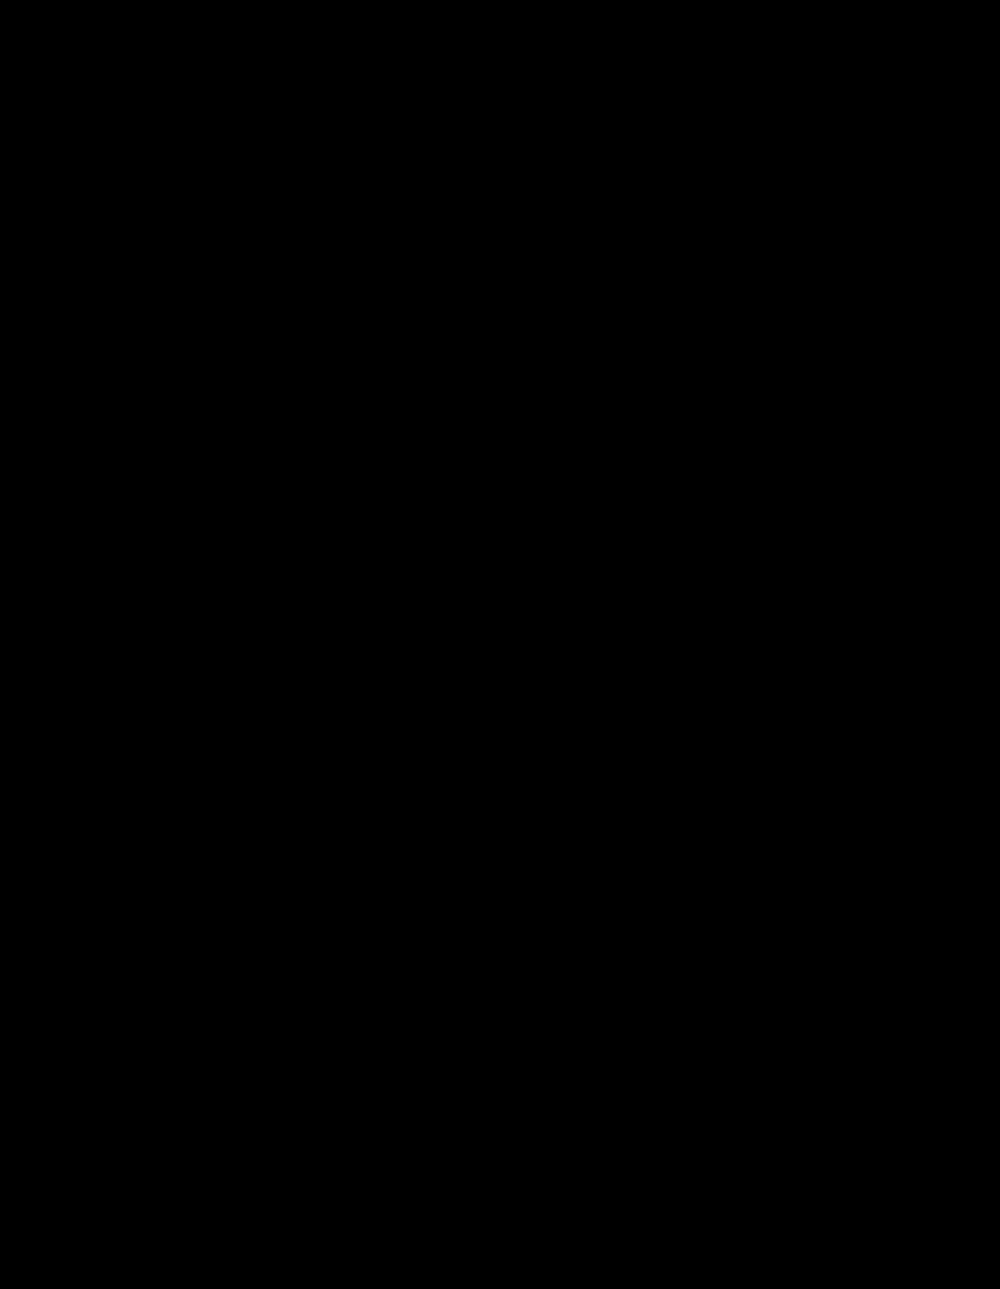 logo-black (13).png